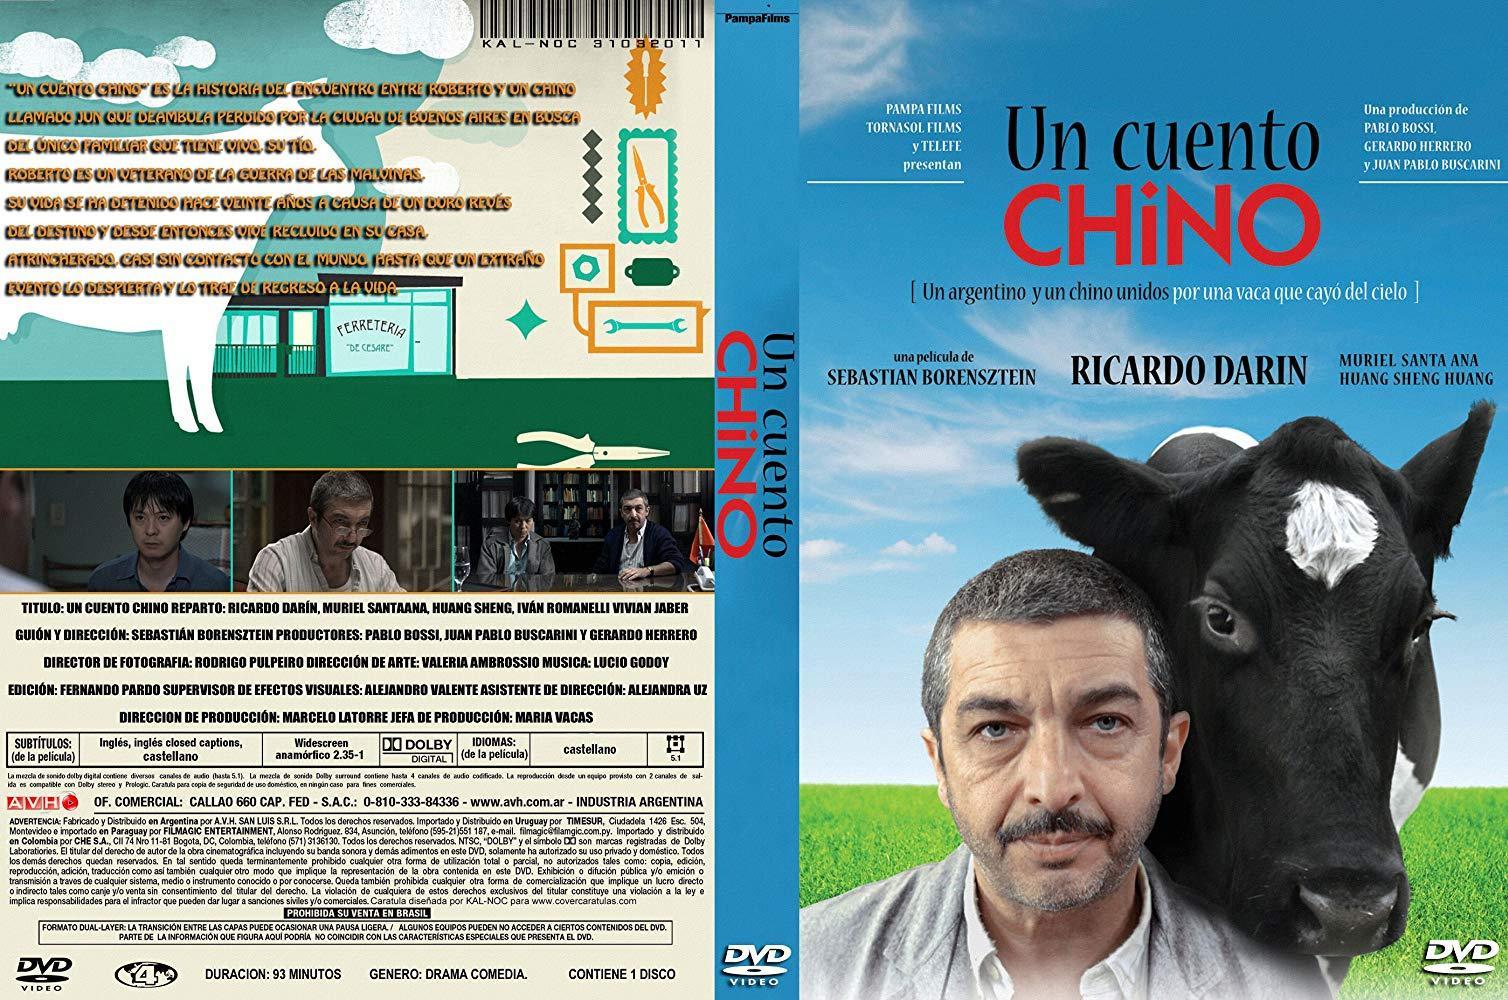 مشاهدة فيلم Chinese Take Out 2011 HD مترجم كامل اون لاين